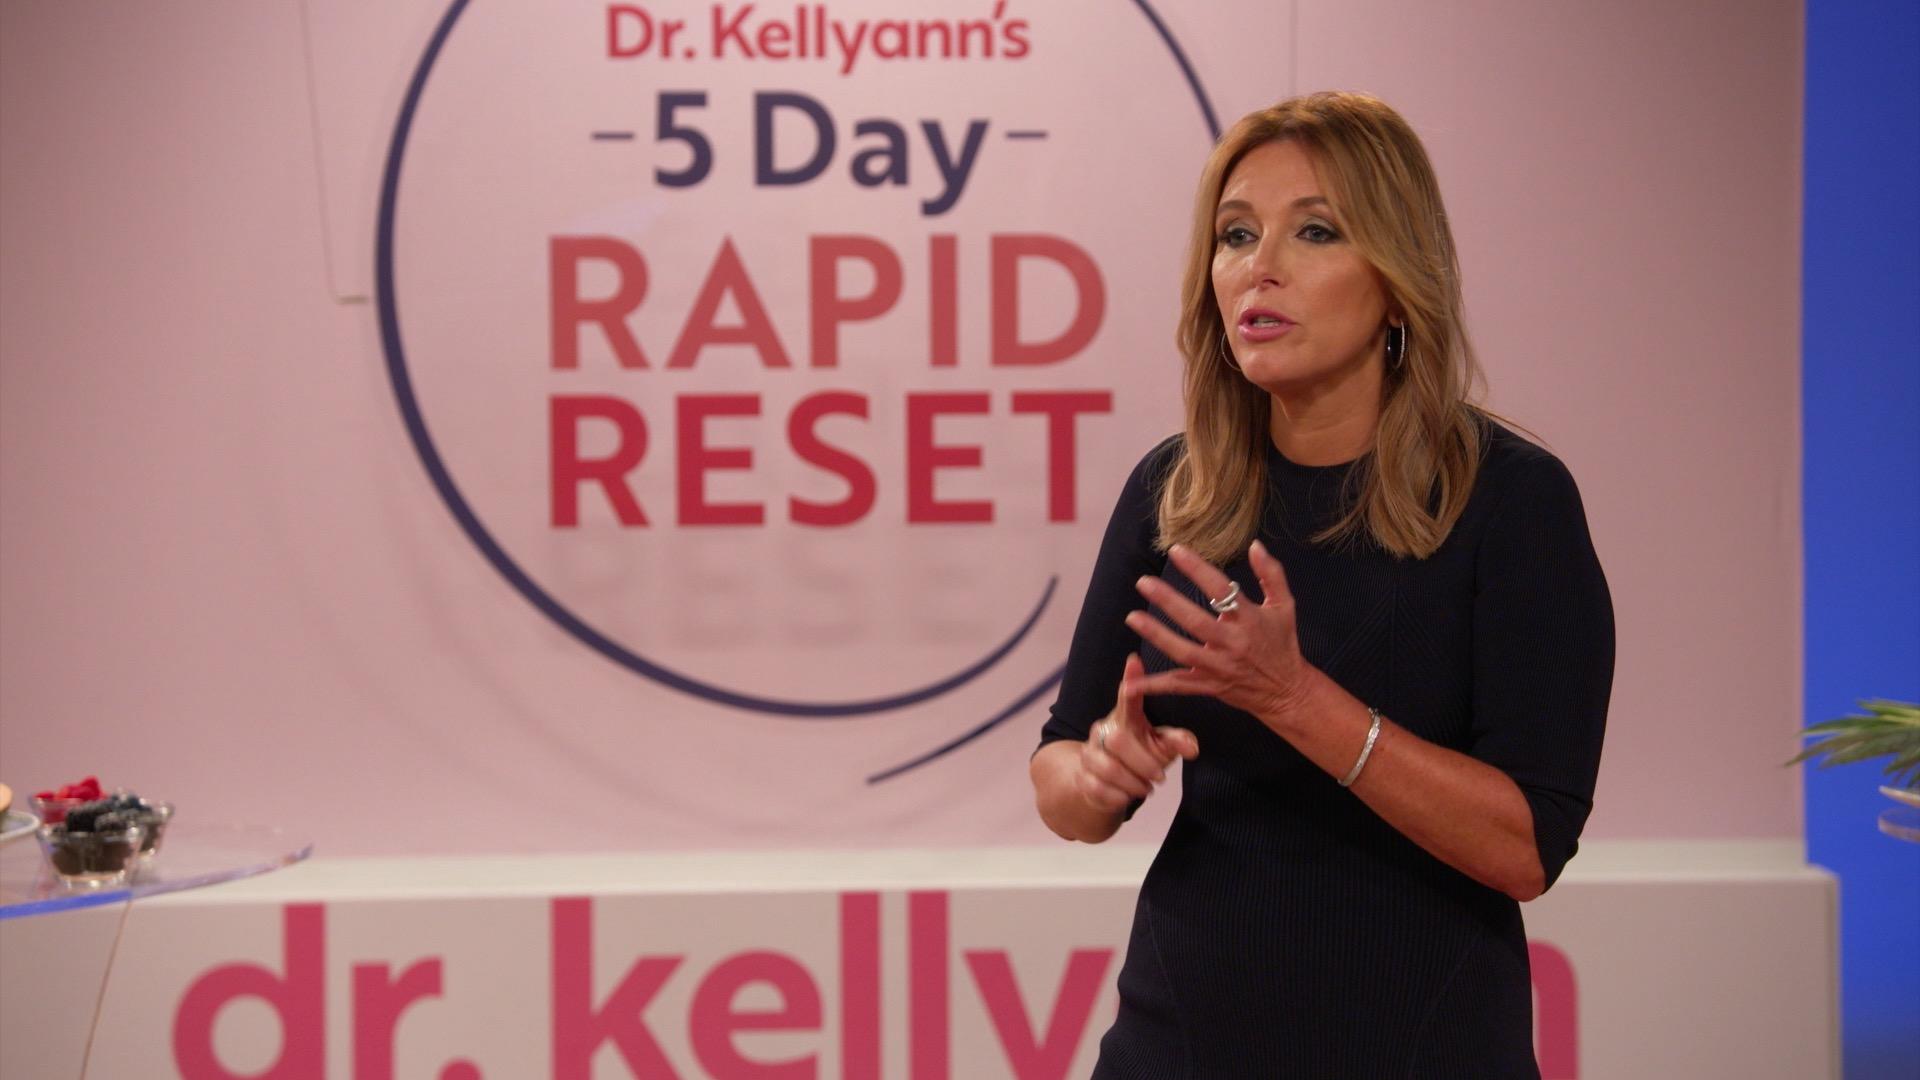 5 Day Rapid Reset with Dr. Kellyann